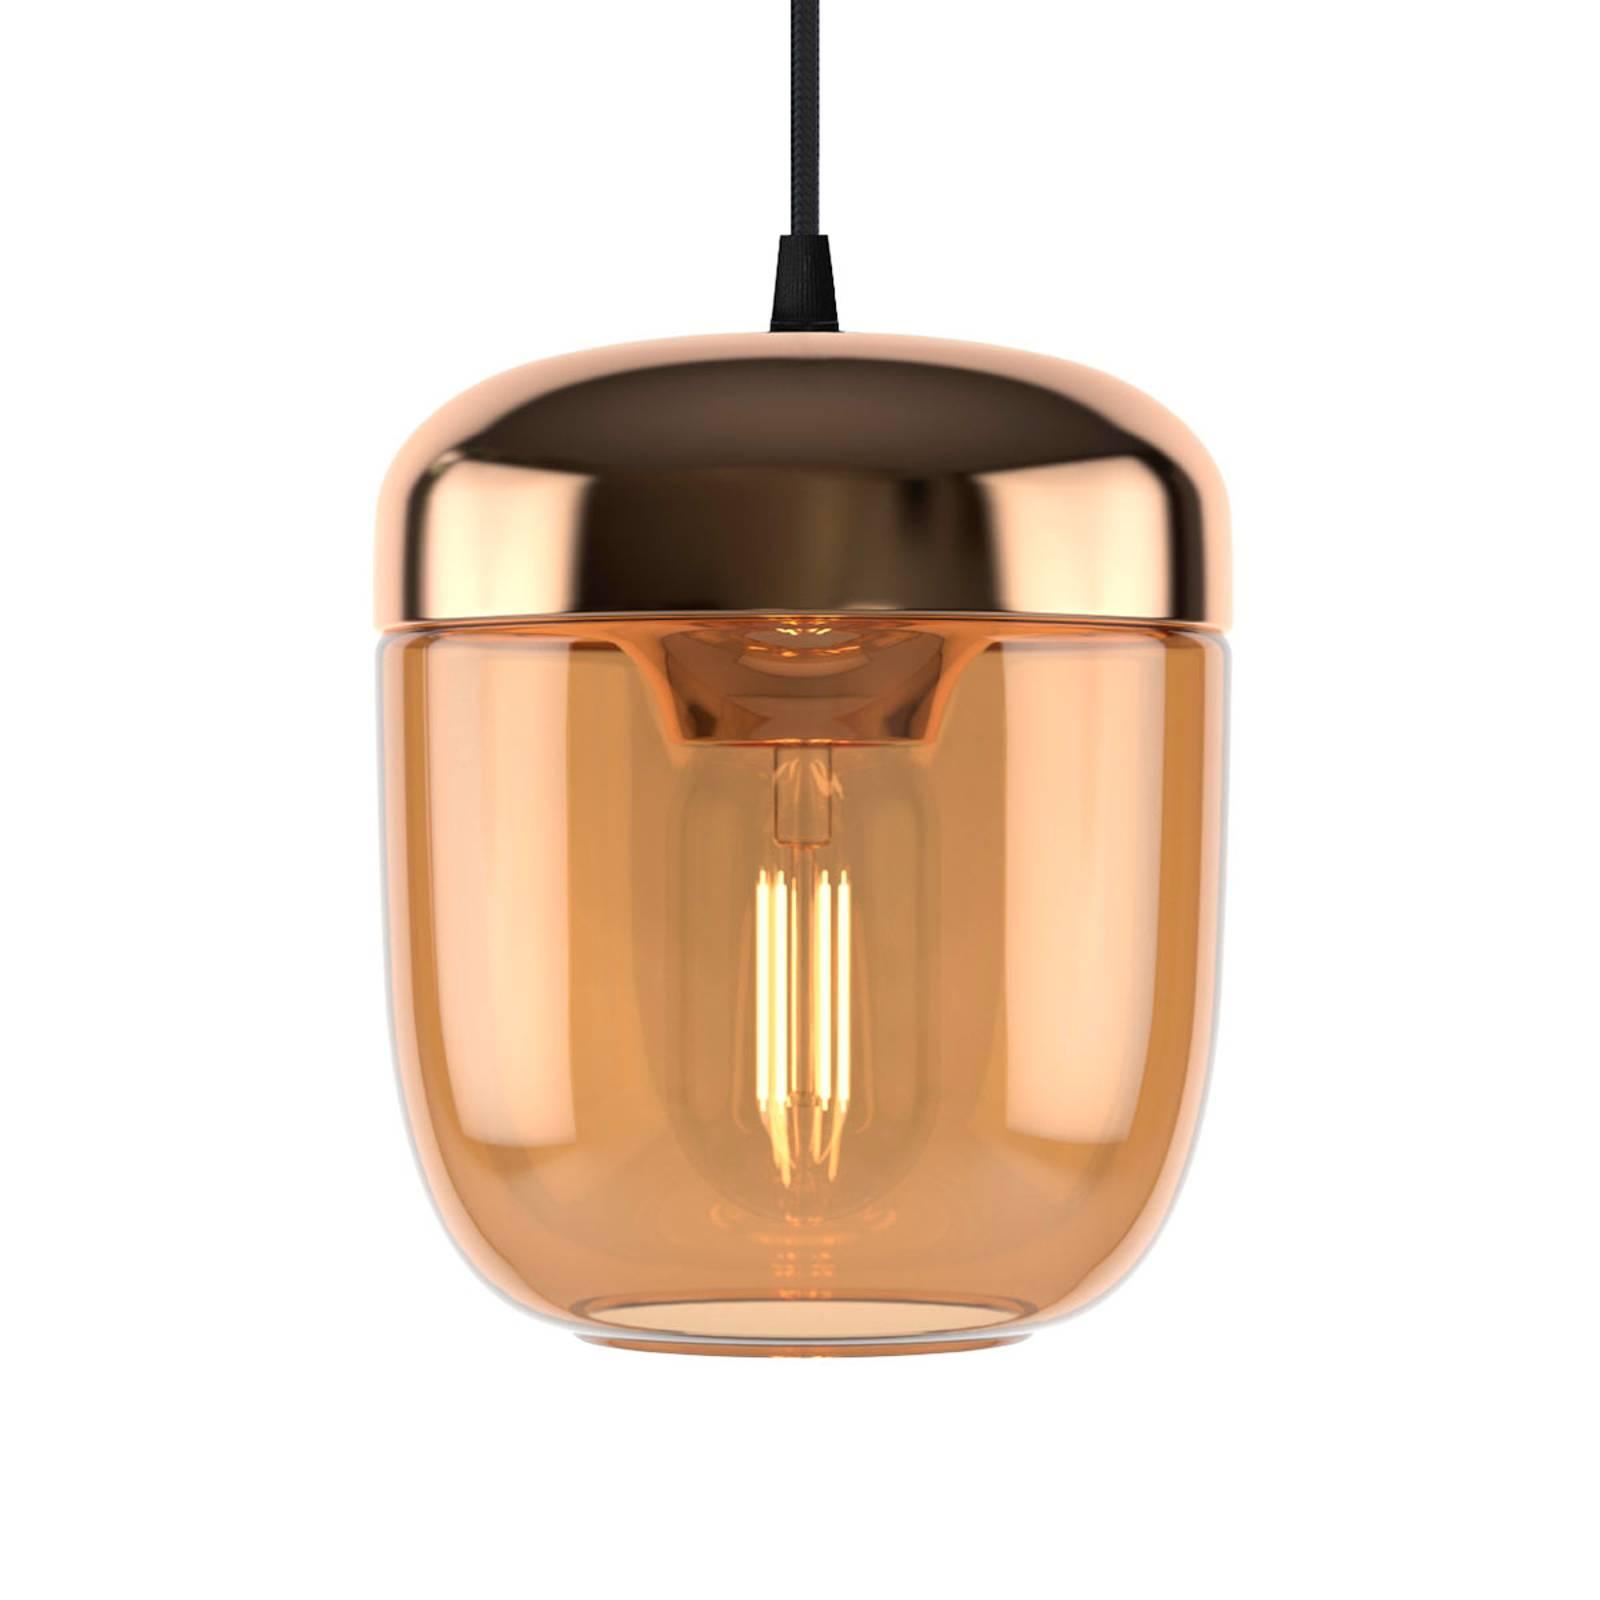 UMAGE Acorn hanglamp 1 lampje aardewerk staal